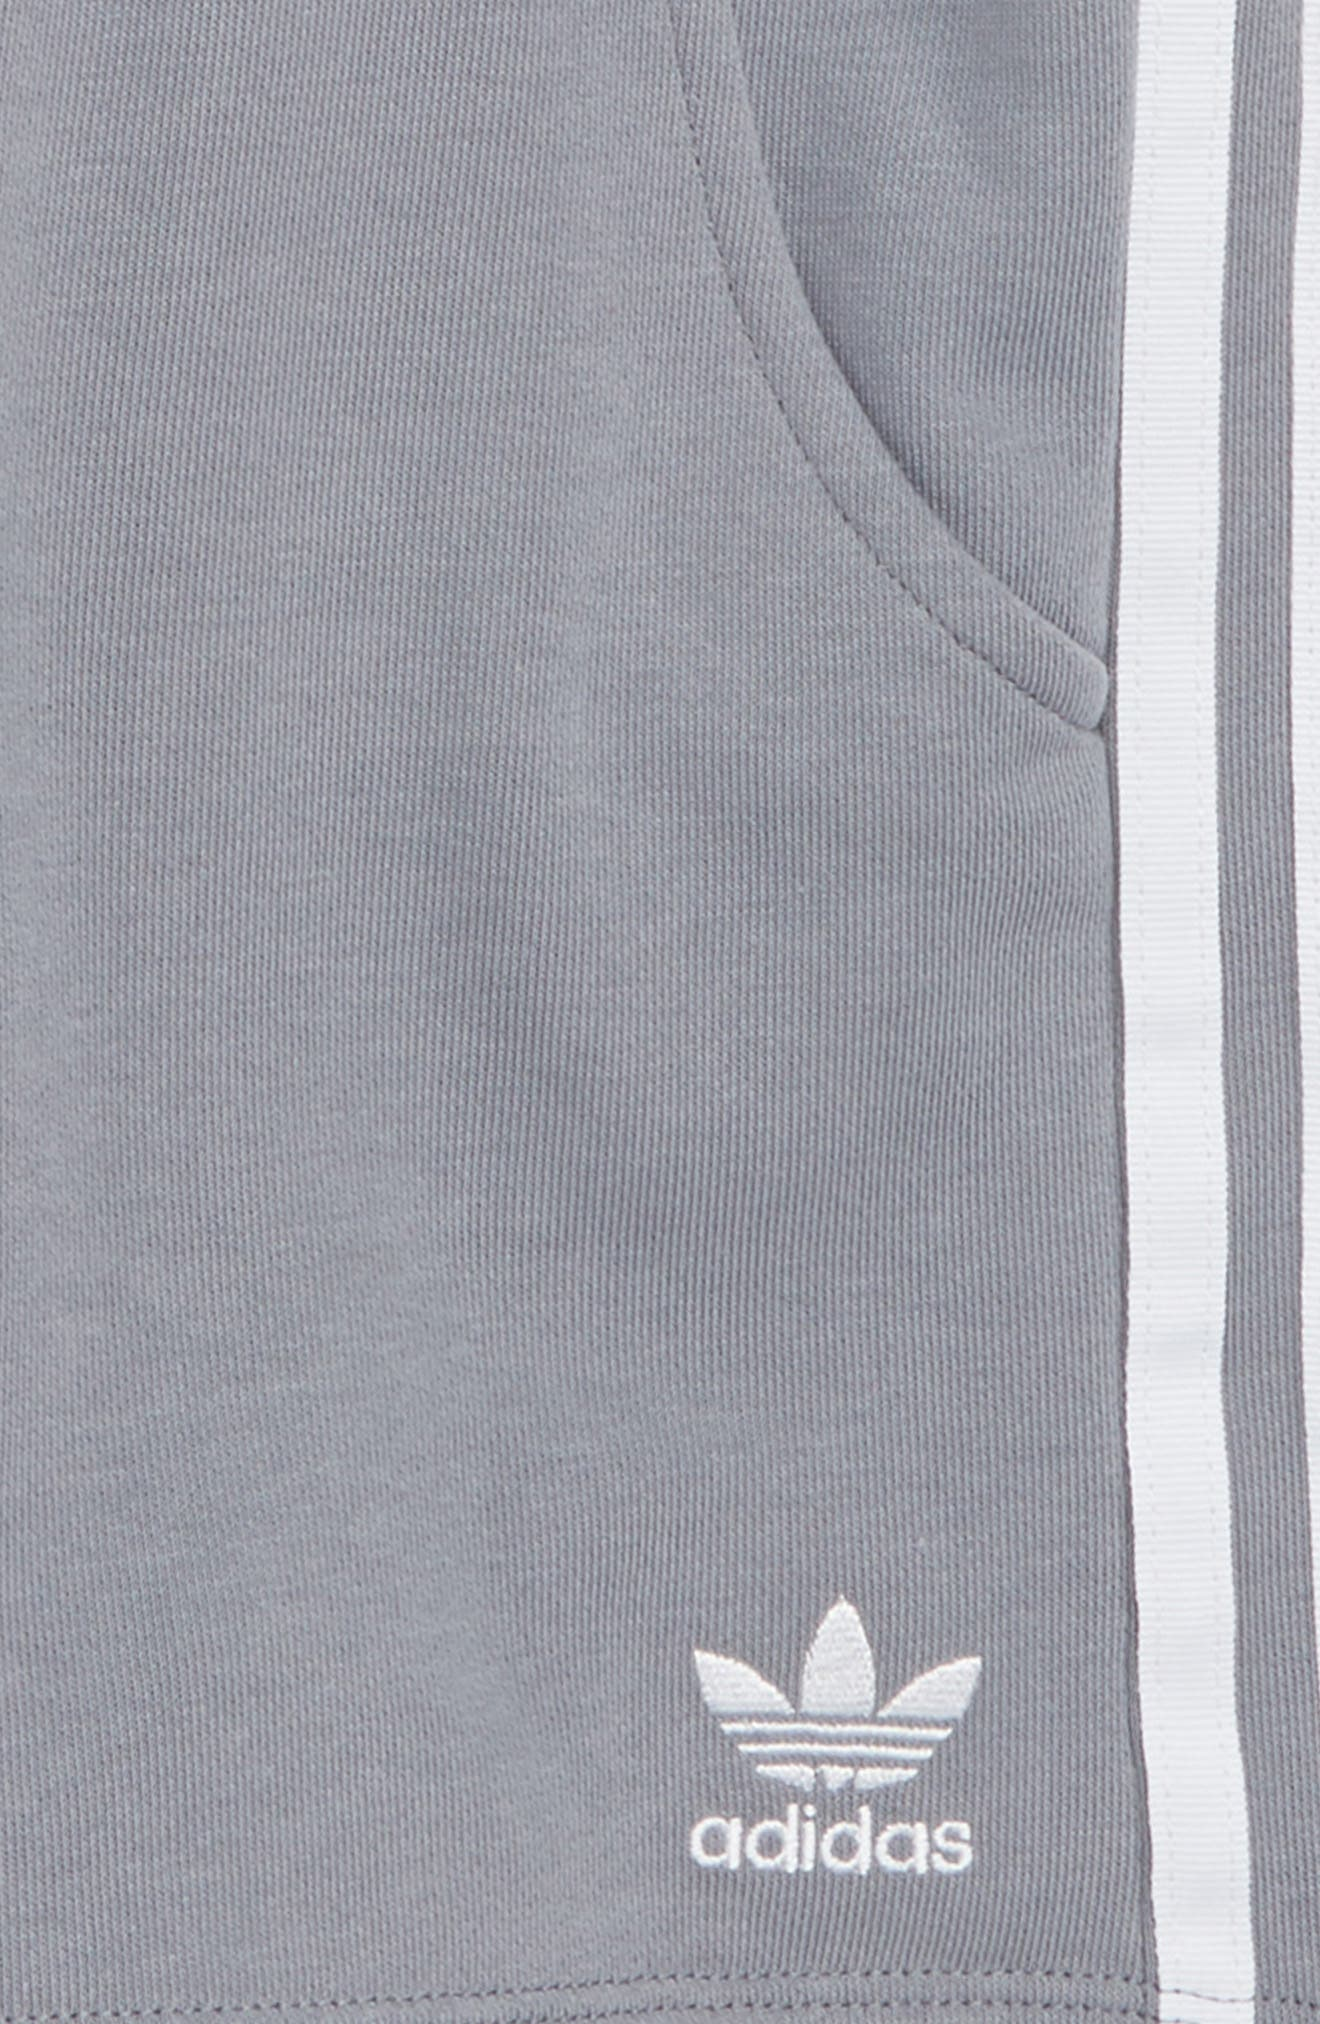 Logo Shorts,                             Alternate thumbnail 2, color,                             Grey